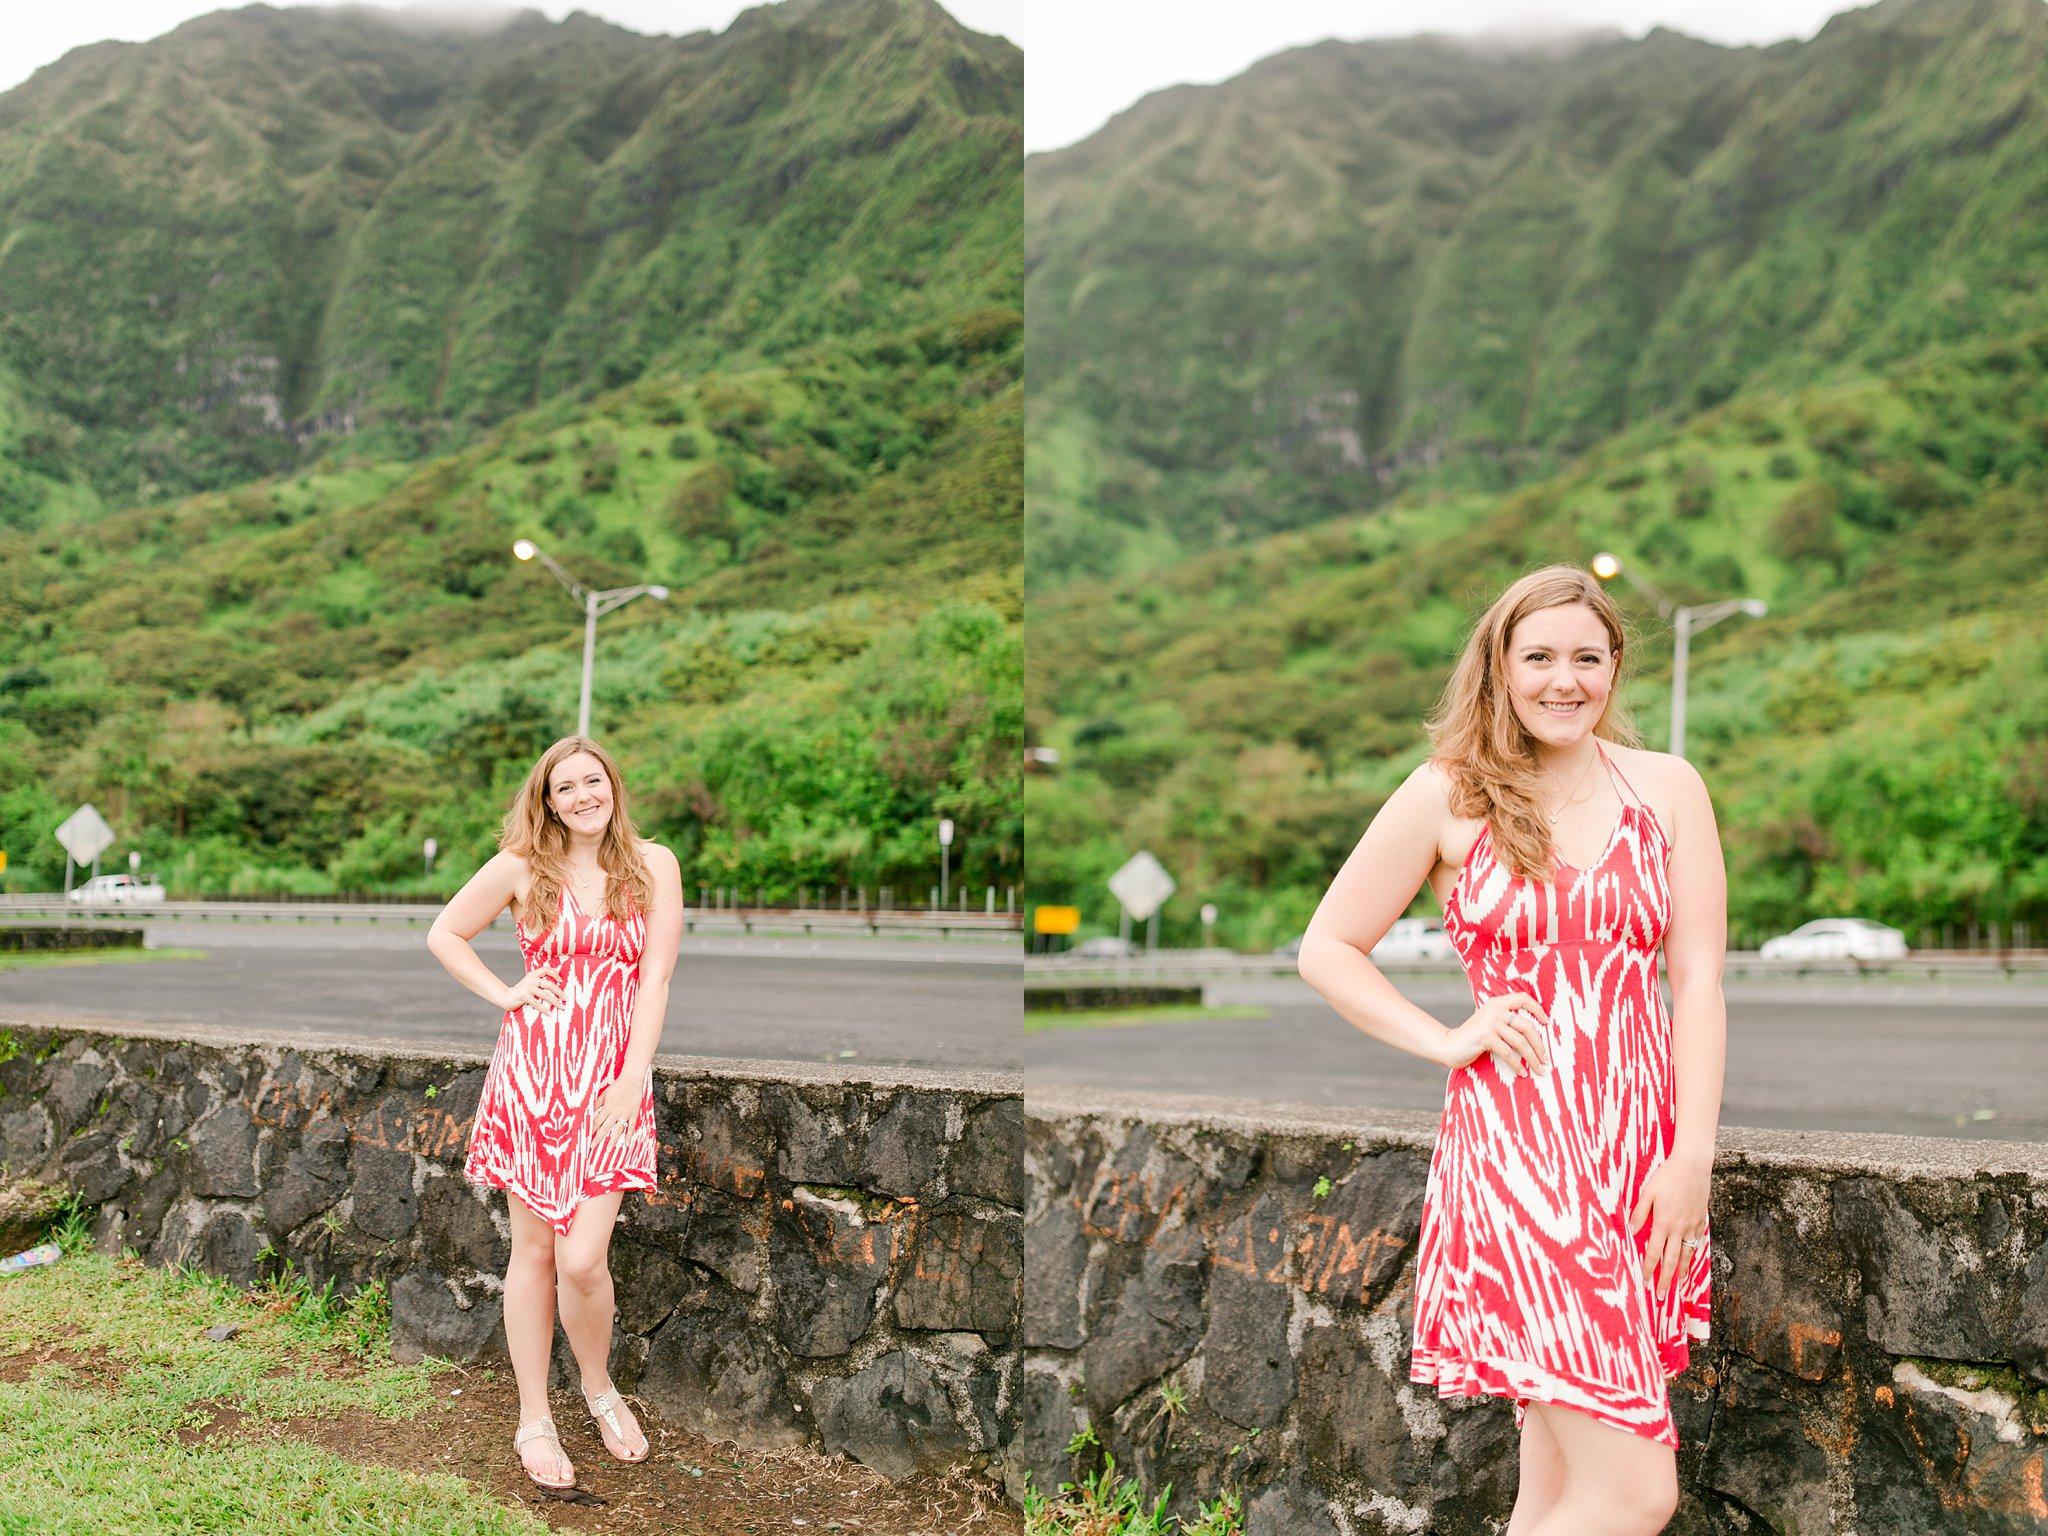 Hawaii Honeymoon Photos Megan & Justin Oahu Vacation Things To Do--14.jpg